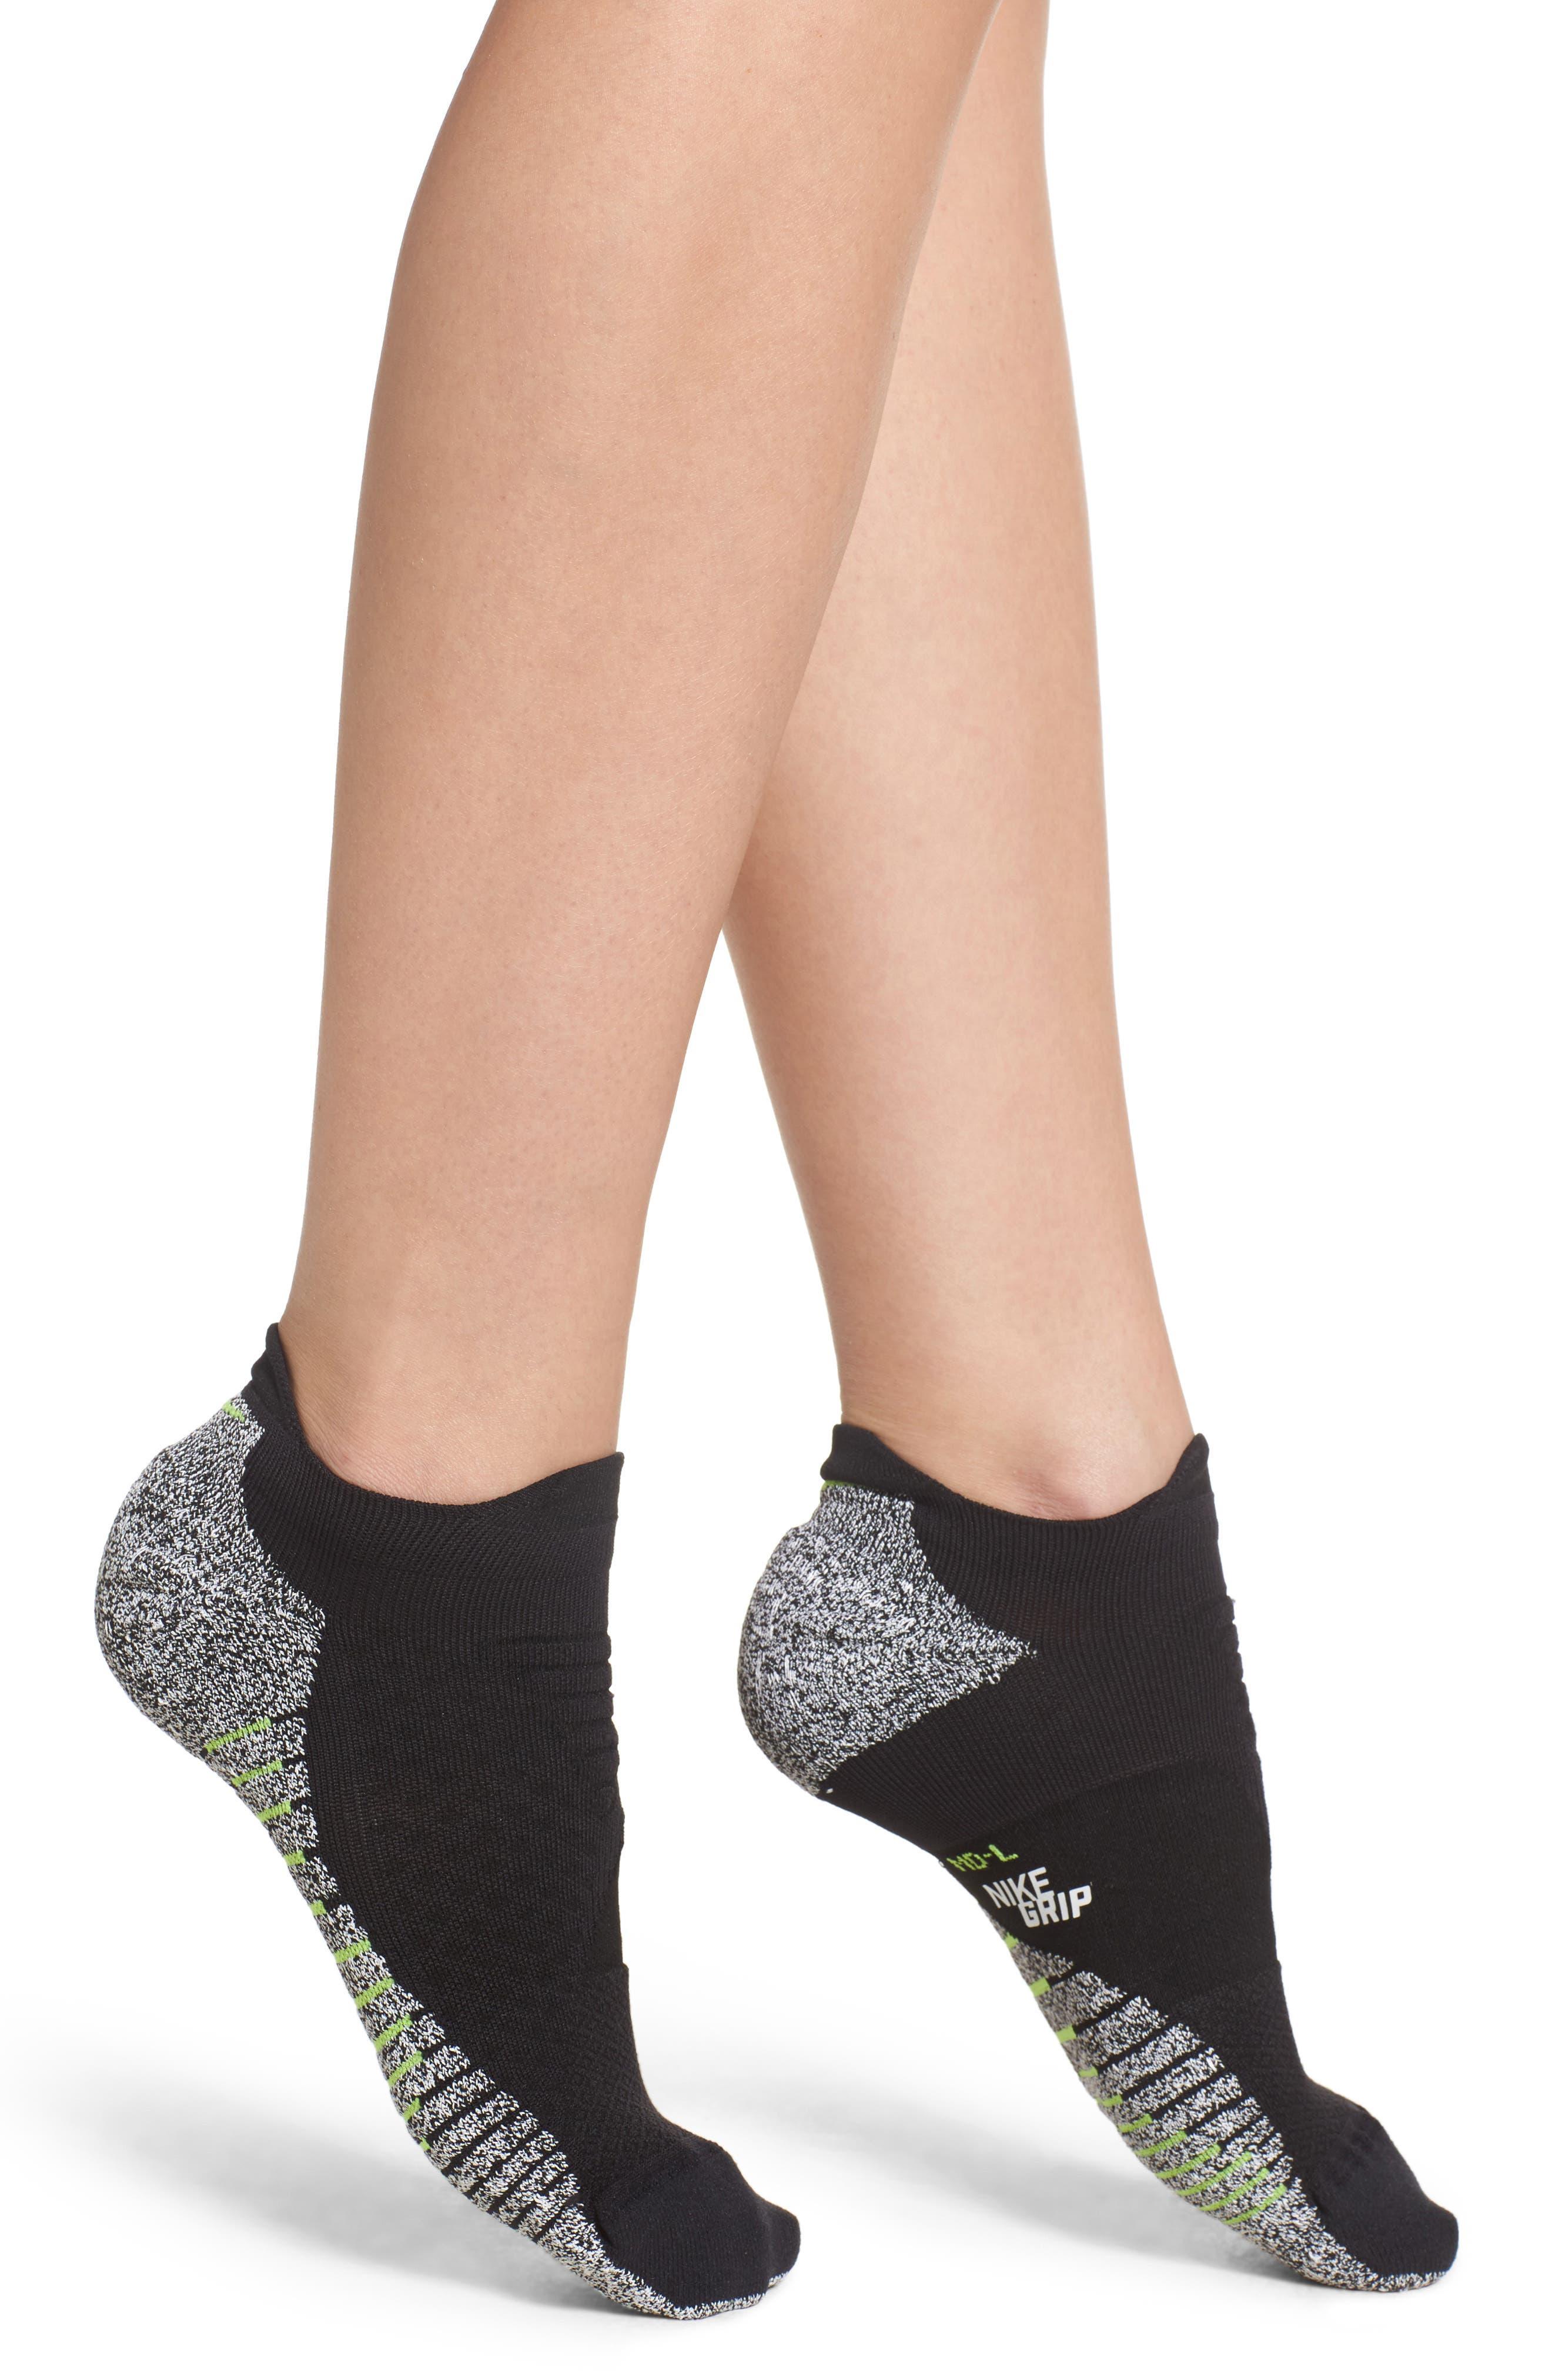 Main Image - Nike NikeGrip Low Cut Socks